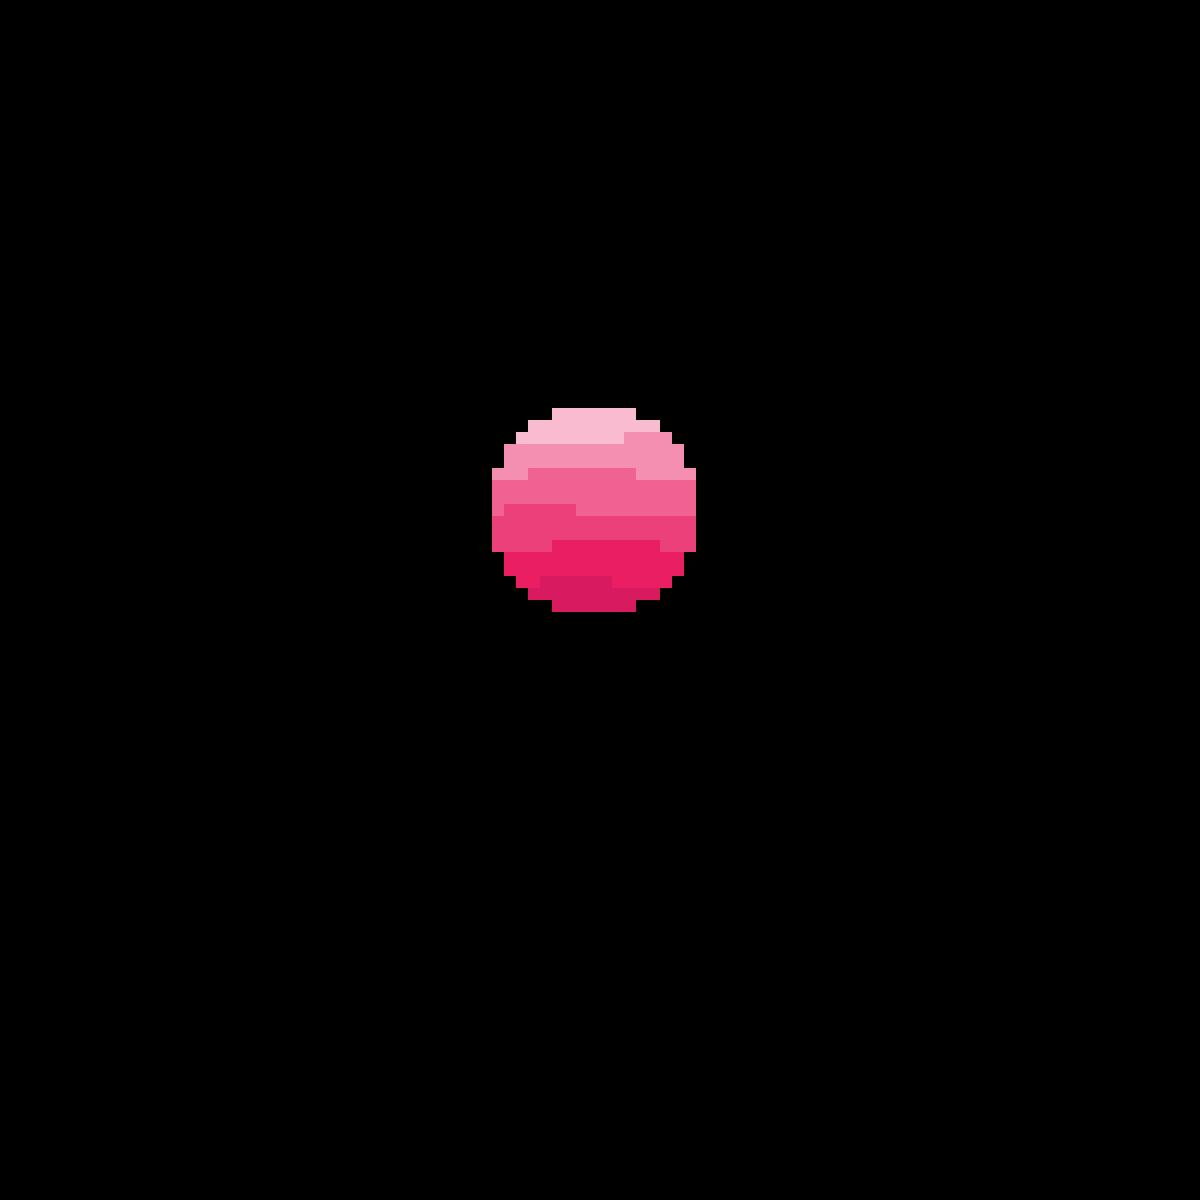 Pink Mars